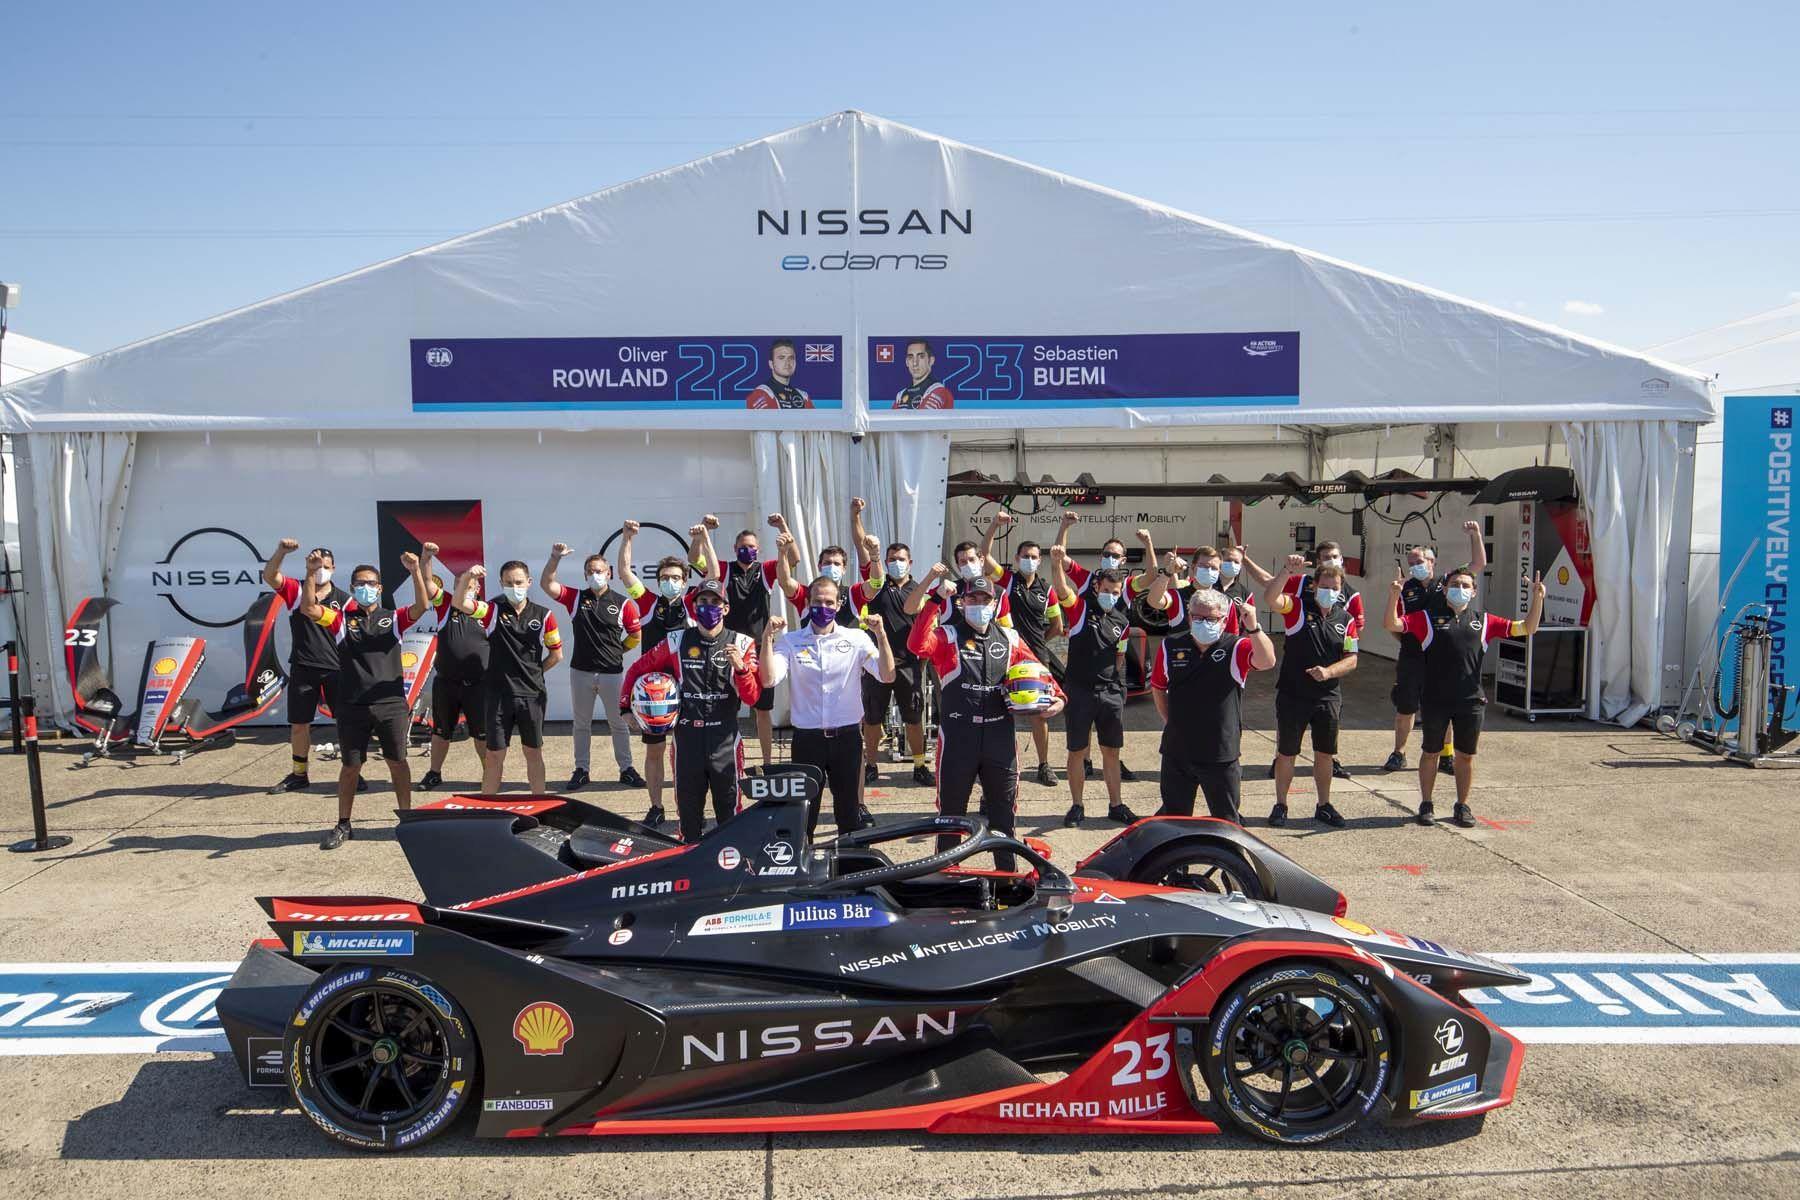 H ομάδα της Nisssan στην Formula E